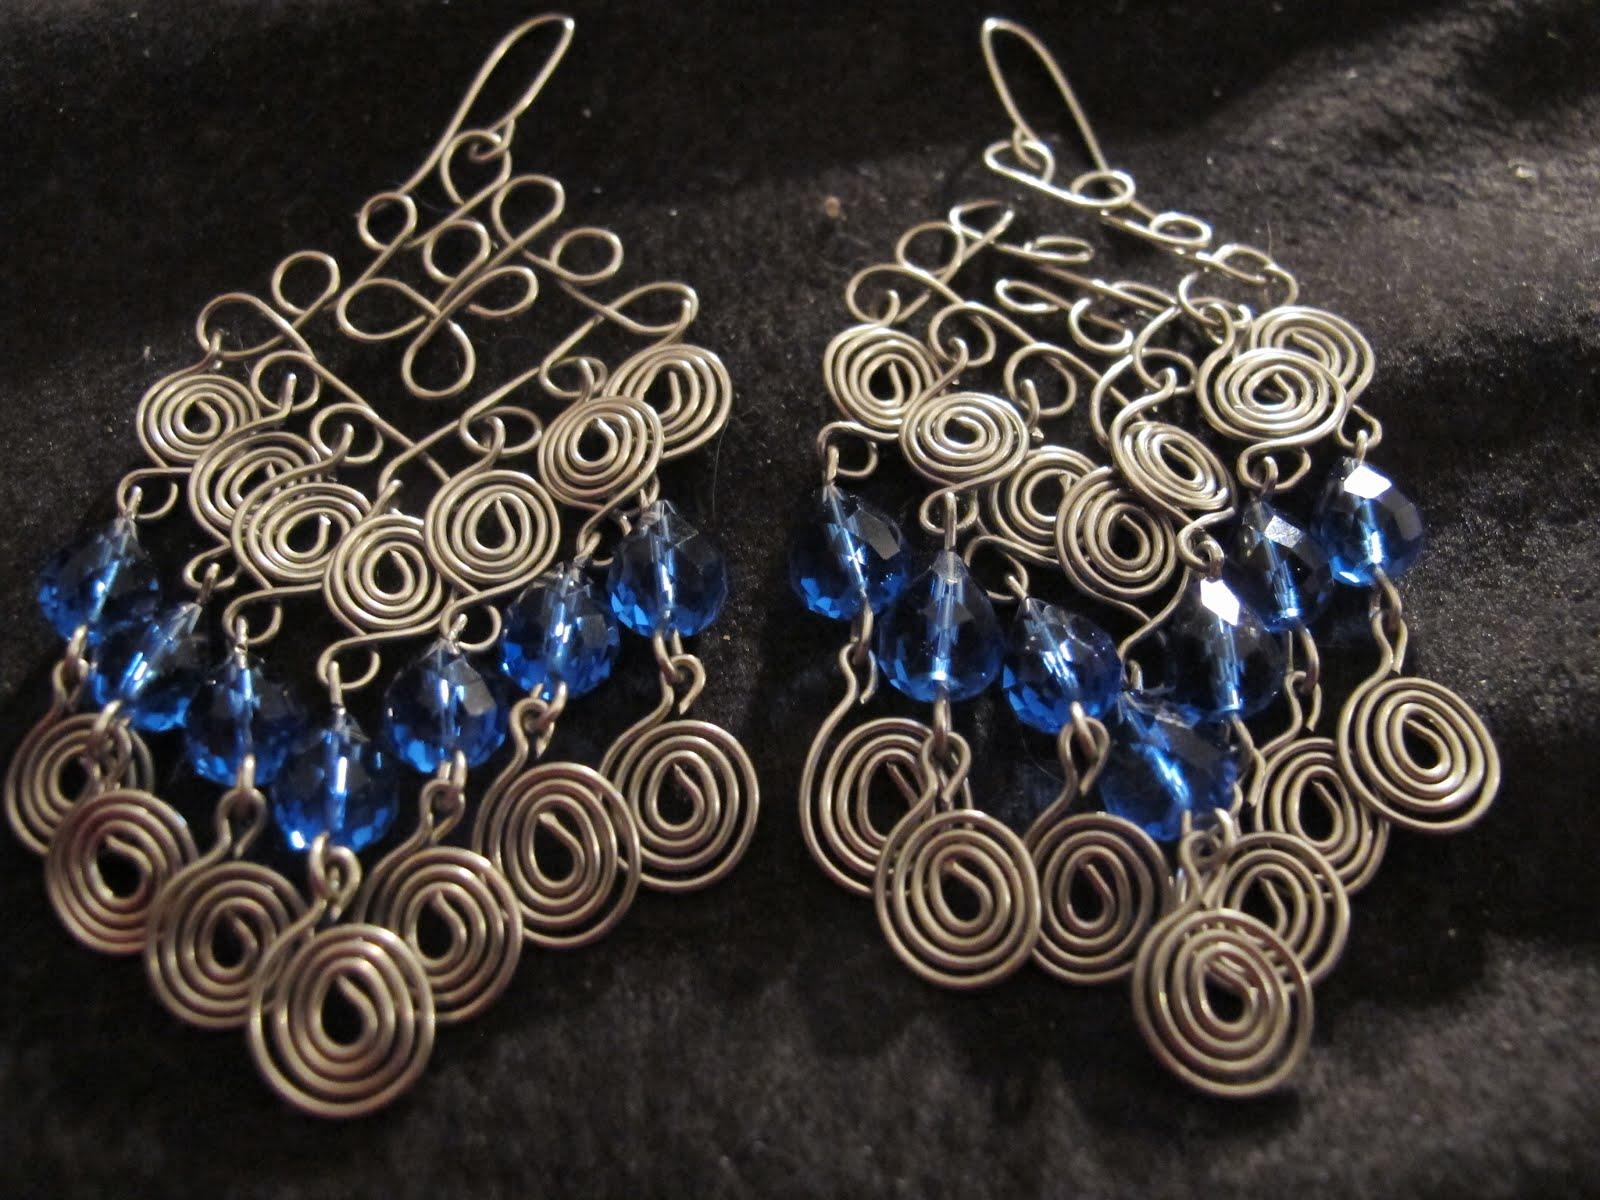 To Purchase My Jewelry, Head To Naomi's Studio Or Naomi's Designs